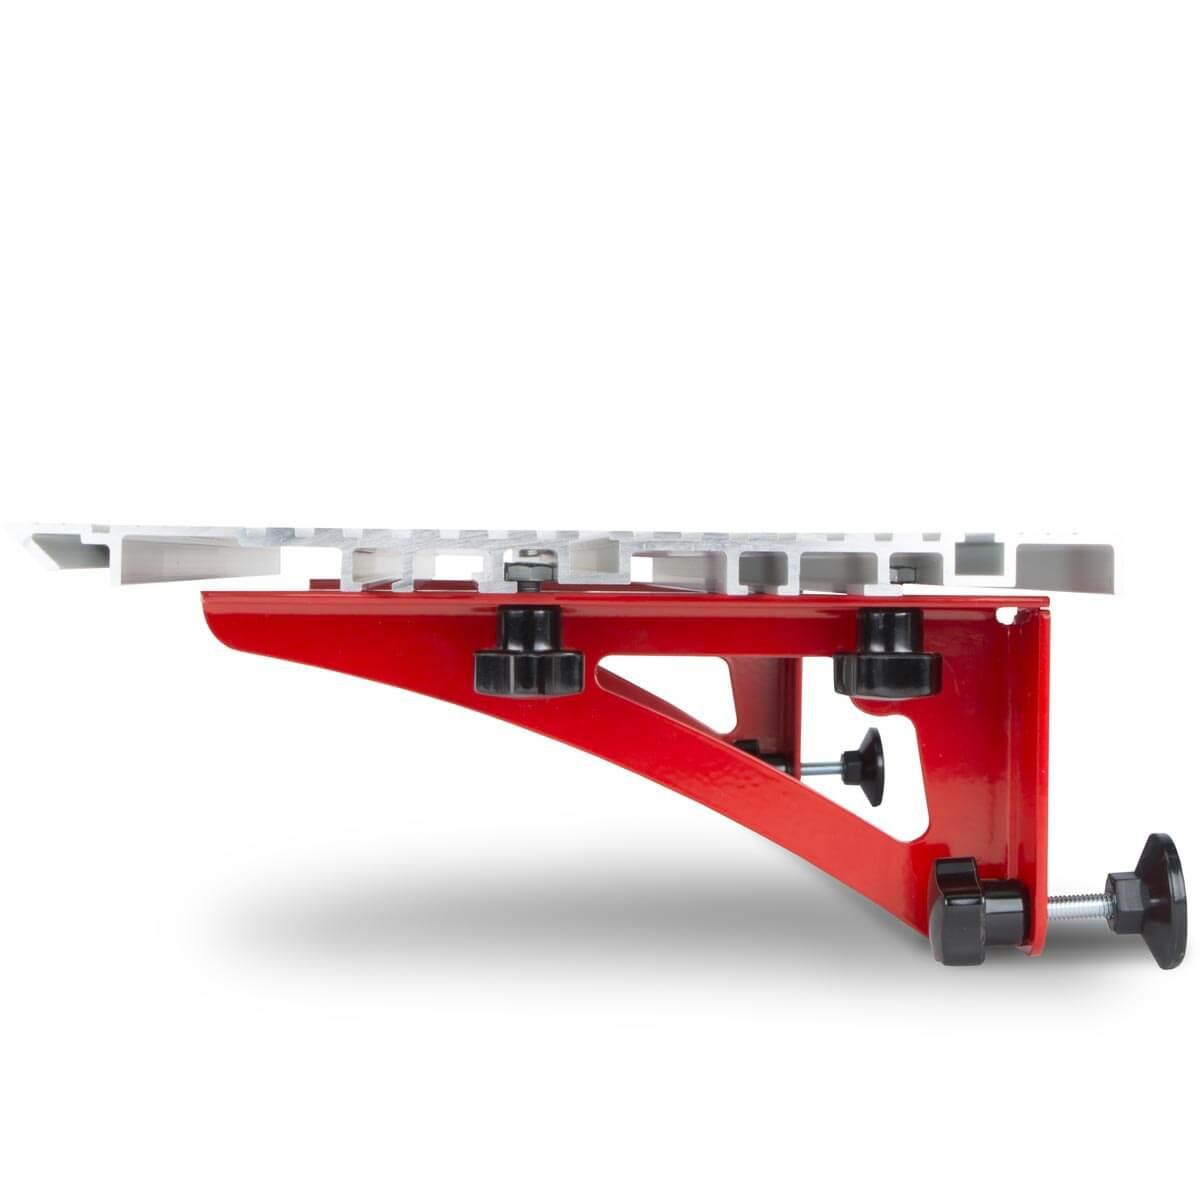 54993 Rubi Side Table rail saws